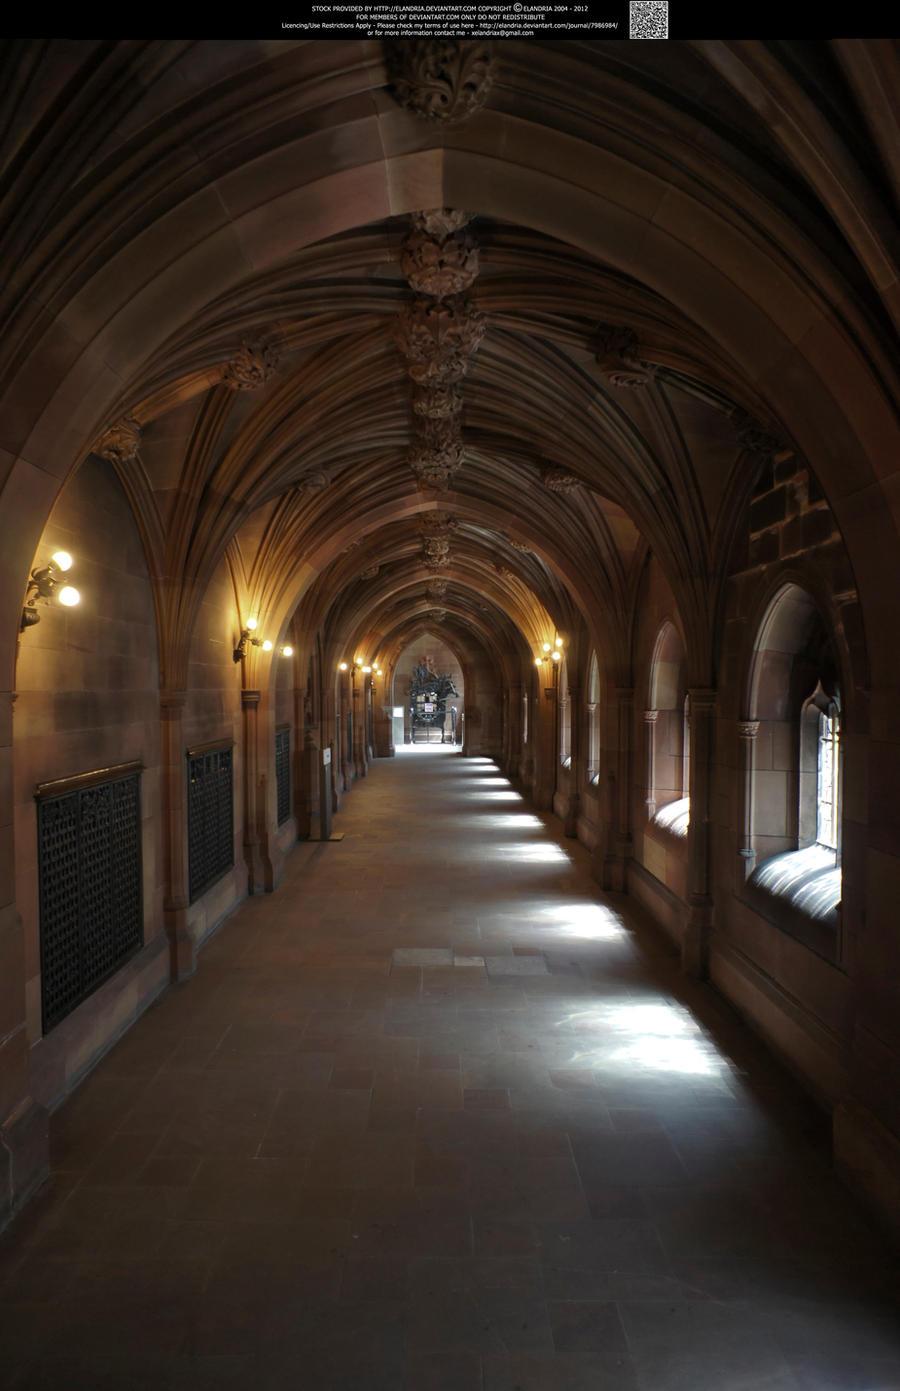 These Hallowed Halls 10 by Elandria